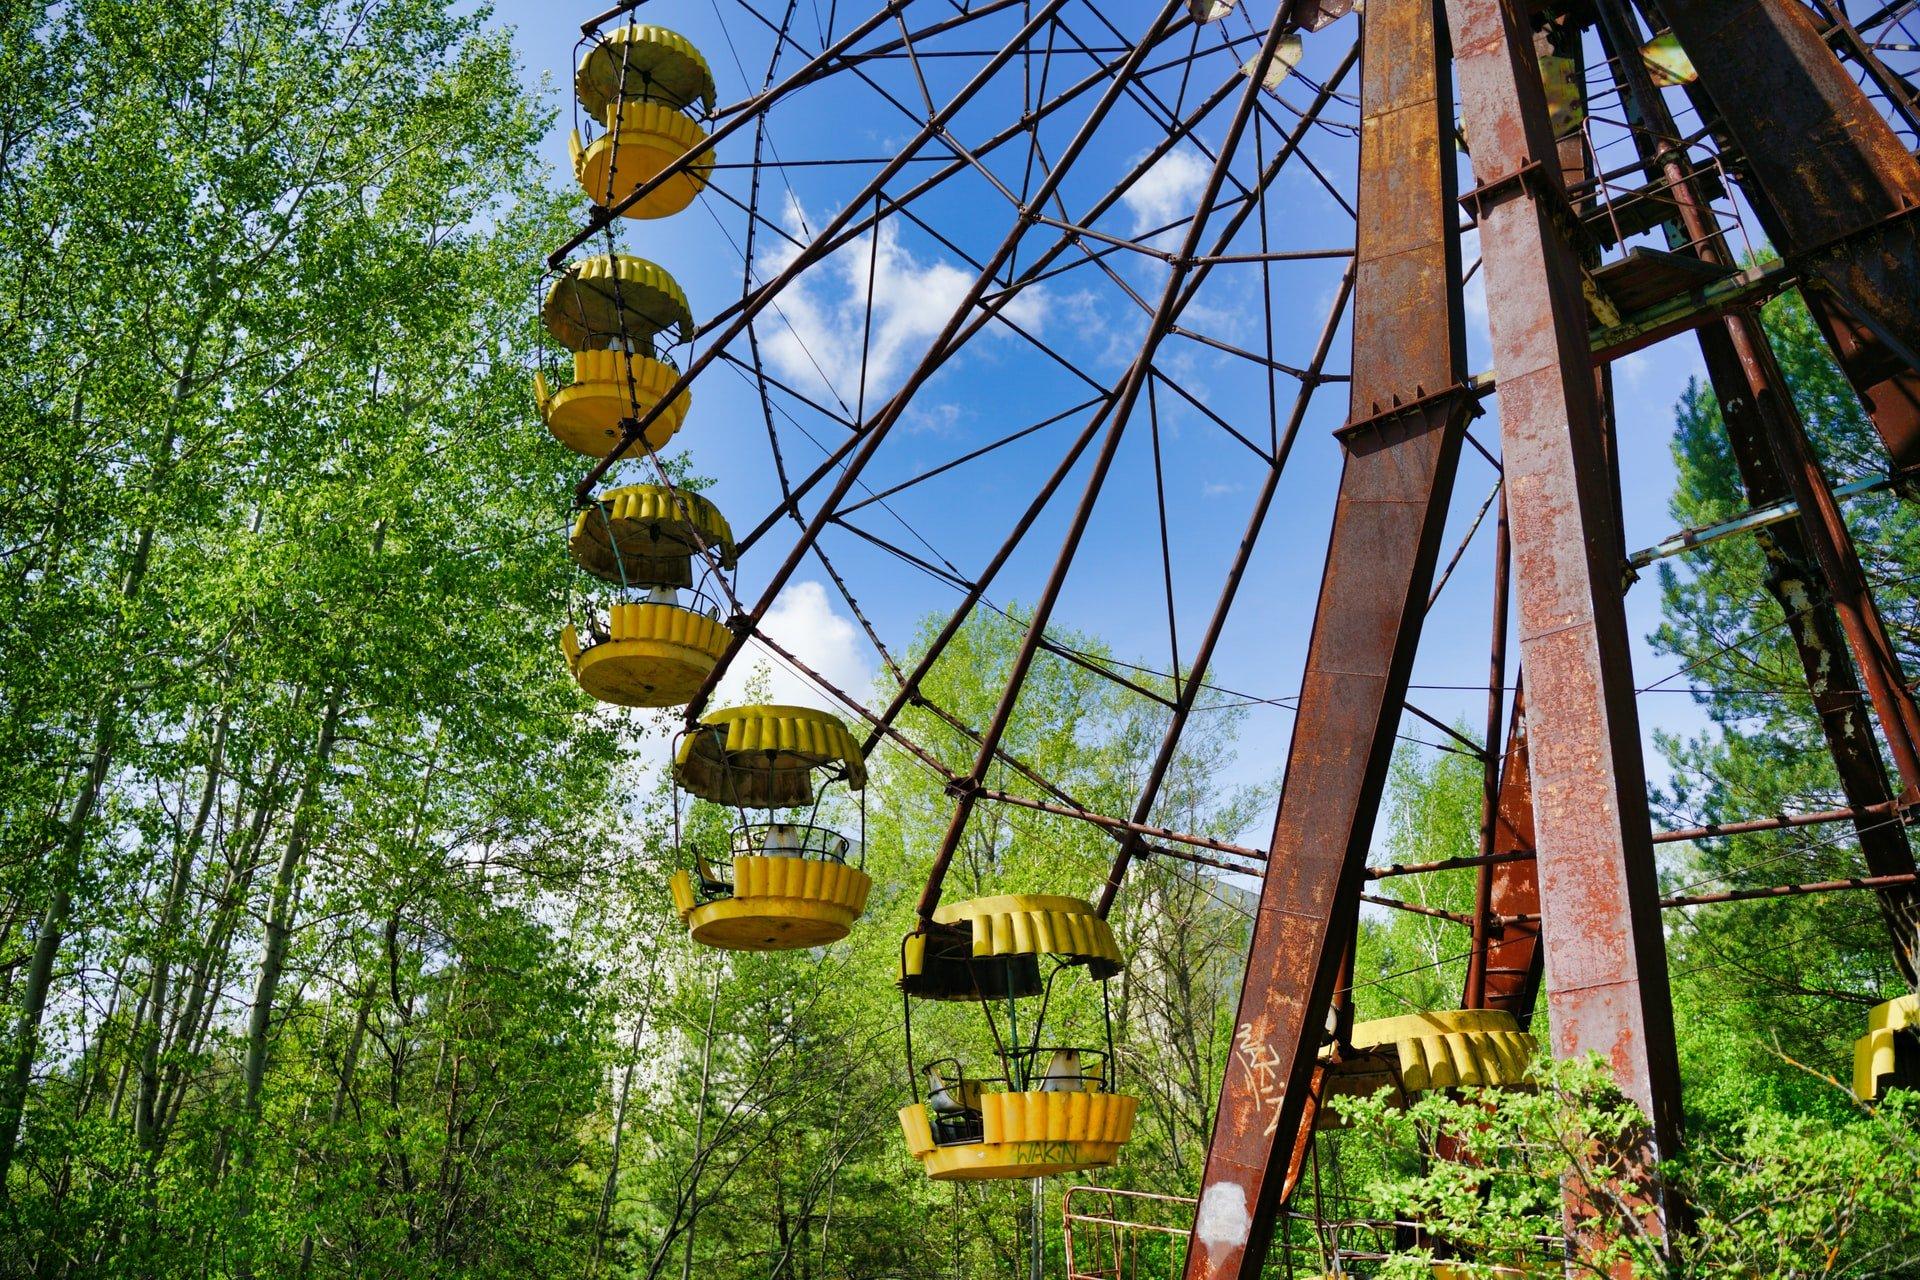 Chernobyl Ferris wheel (photo: Michal Lis, Unsplash)